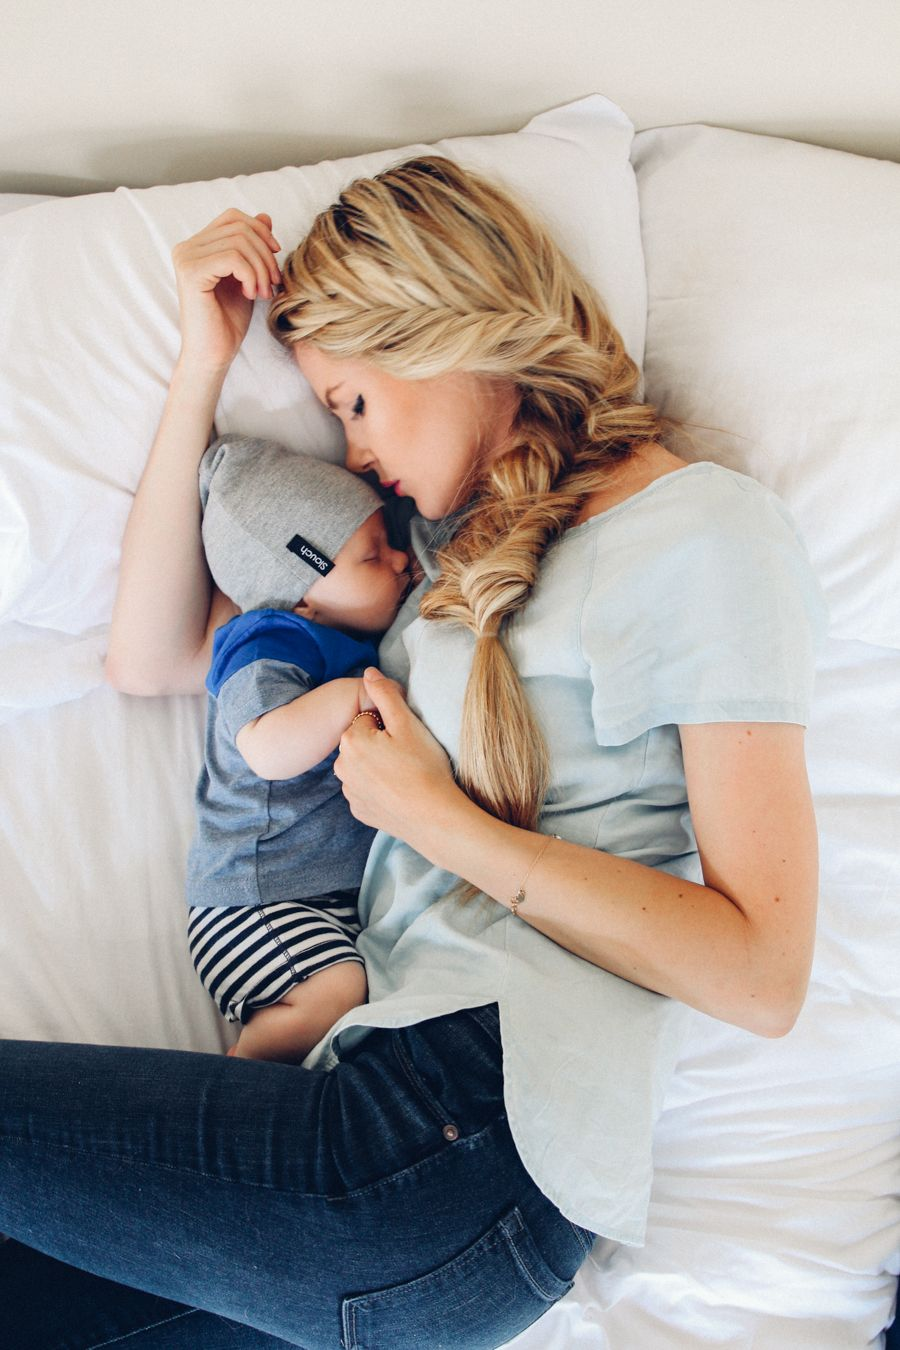 Сын мама спит 9 фотография